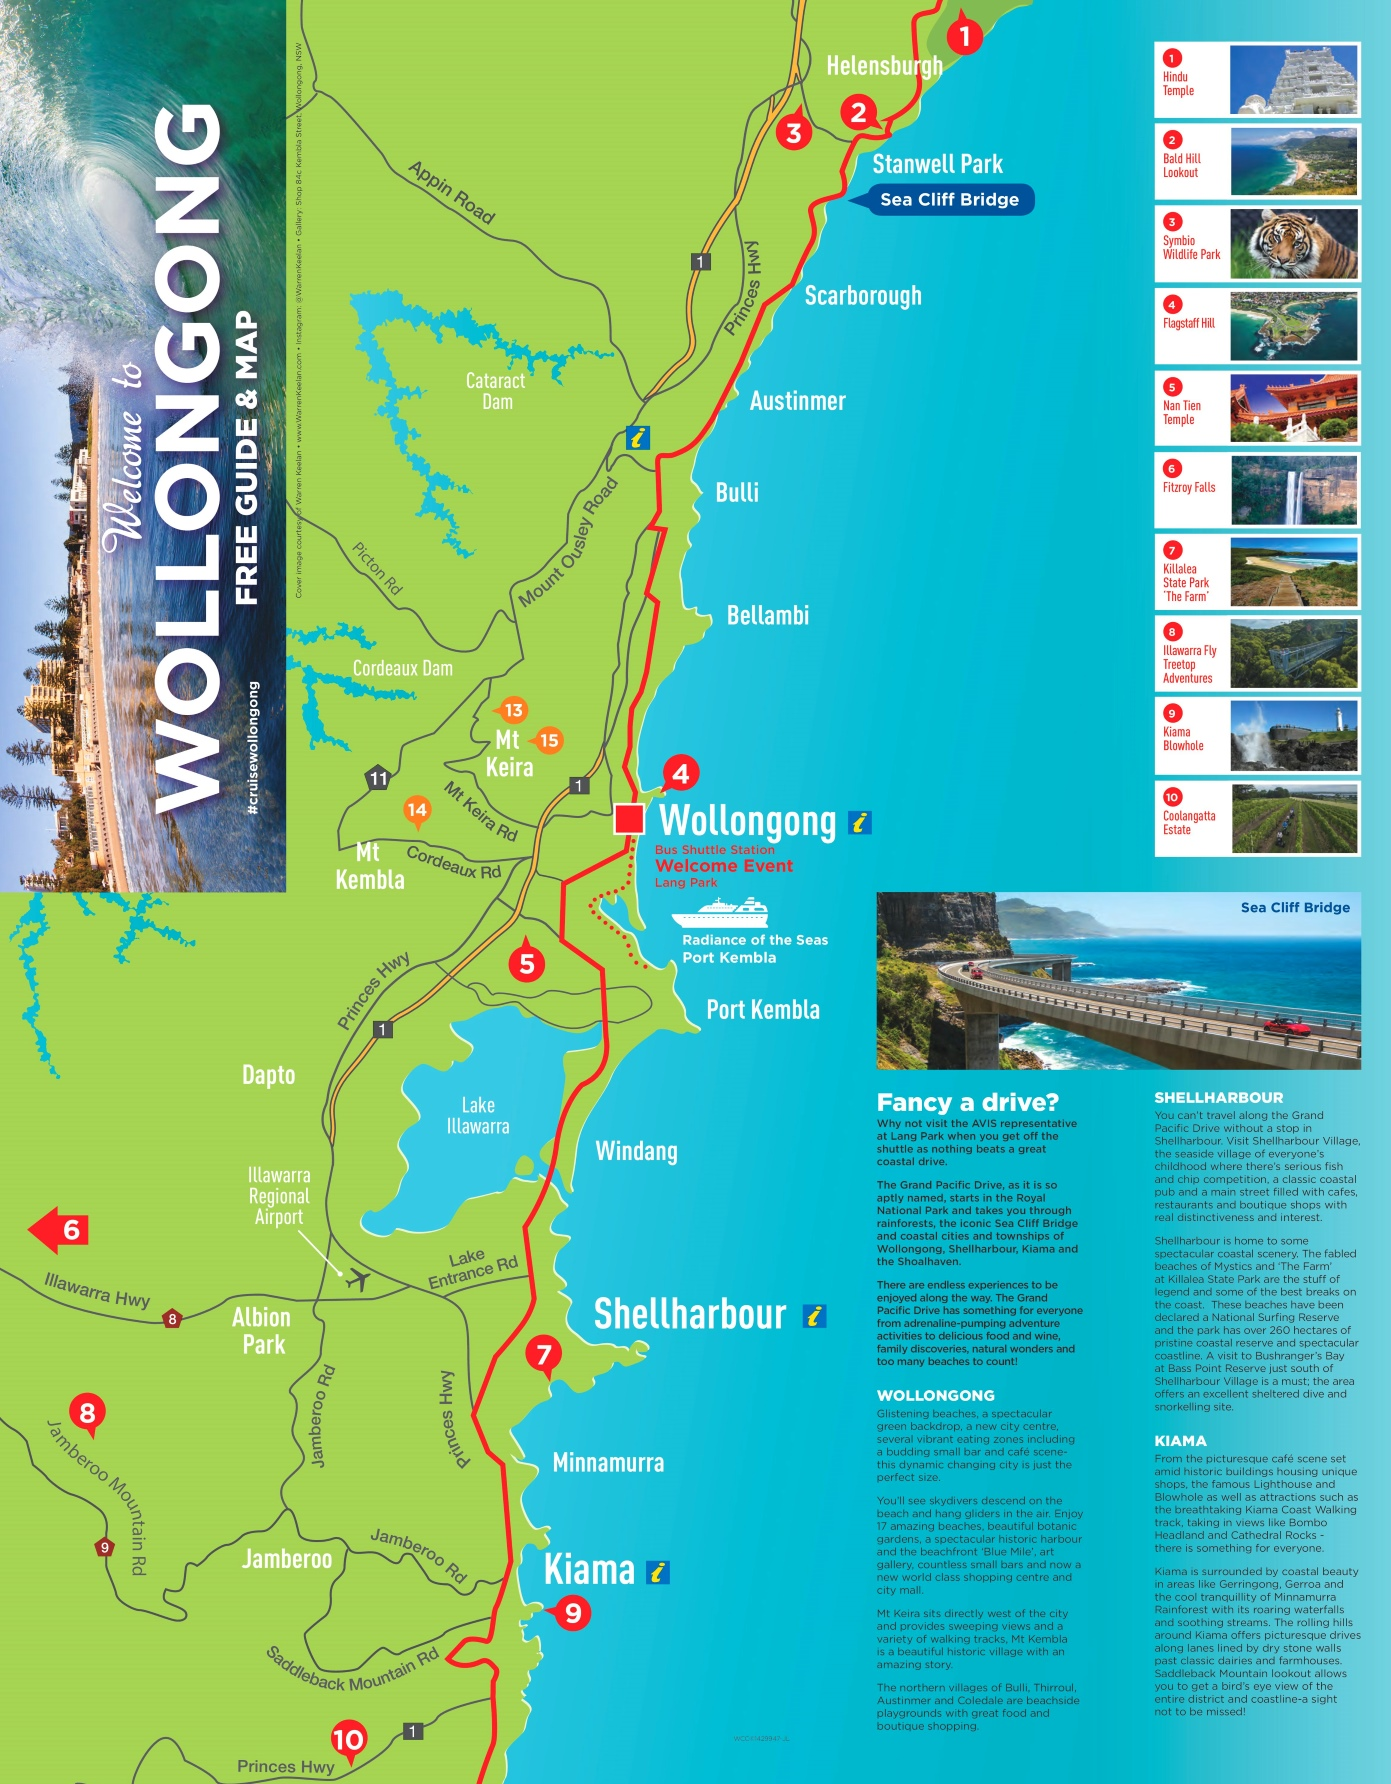 Wollongong area map